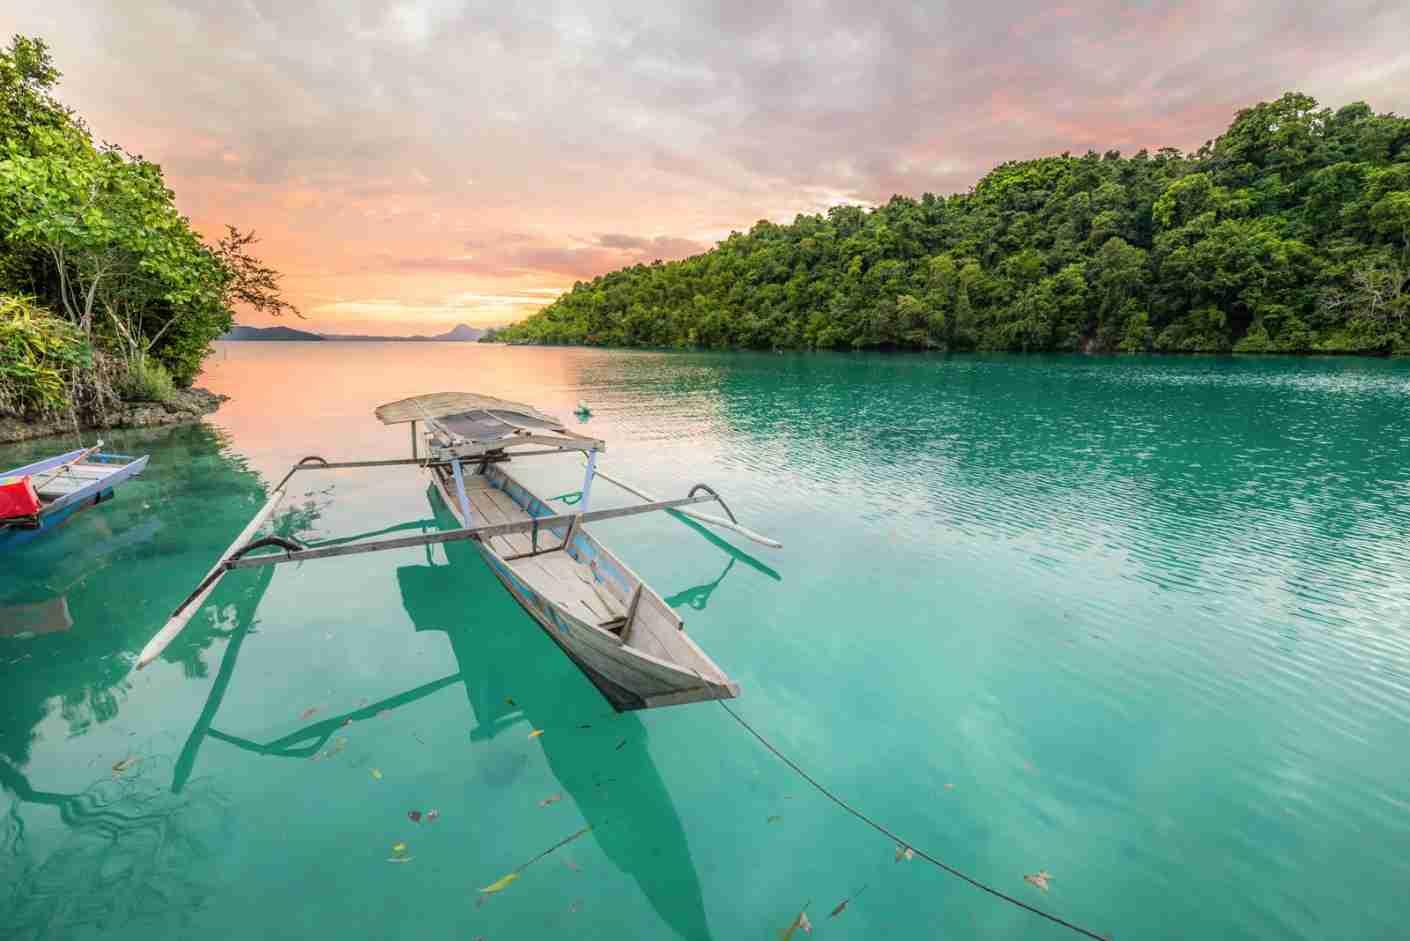 Togian Island. (Photo via Shutterstock)